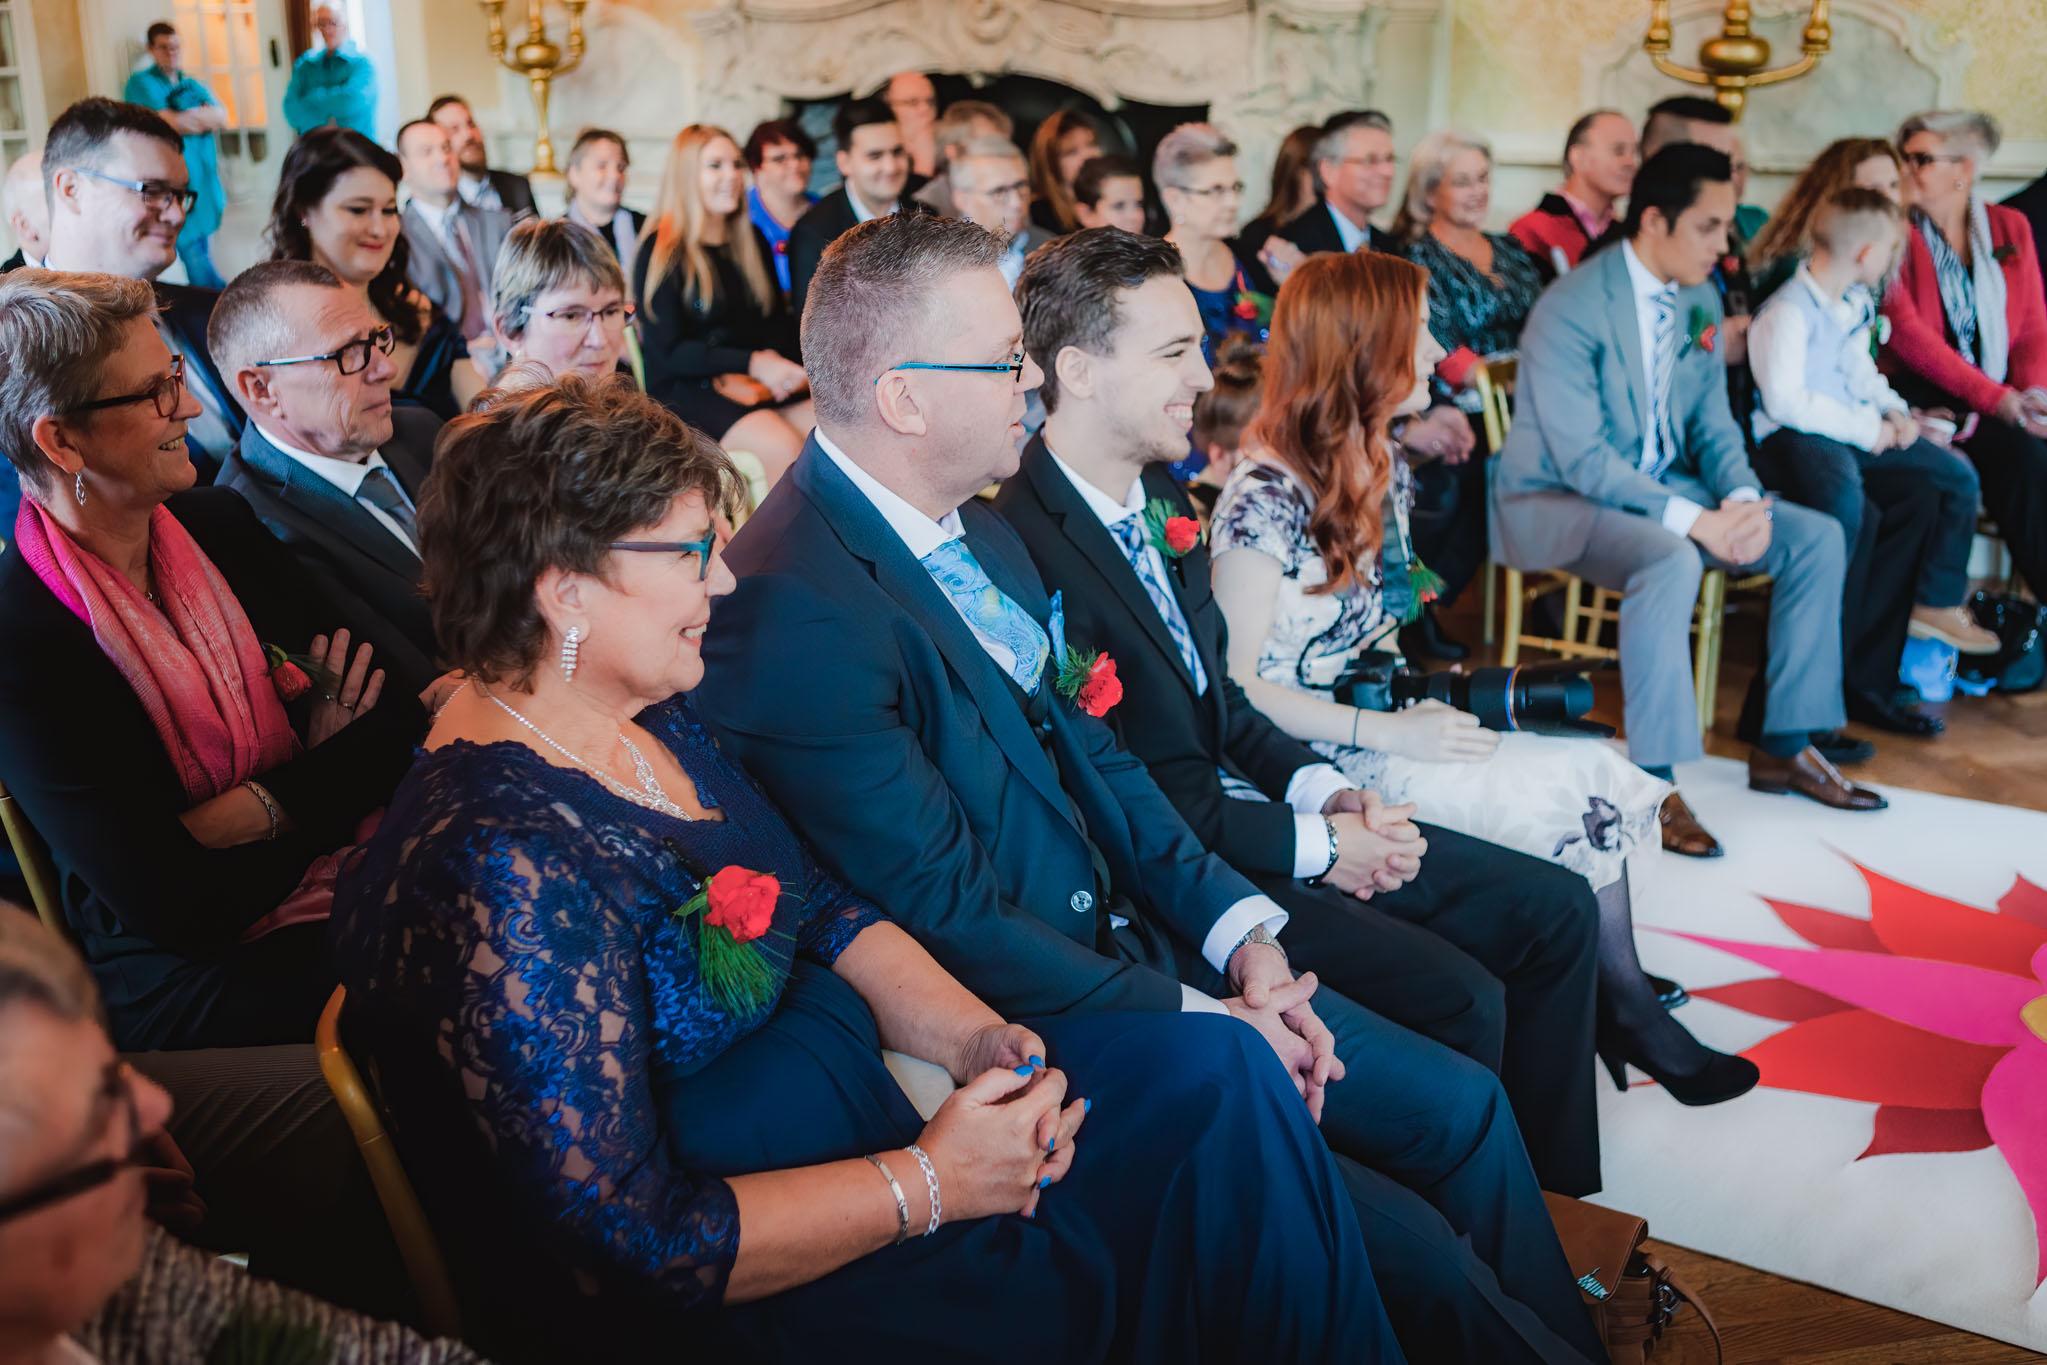 Bruiloft Reportage Wedding Flevoland Lelystad Shot By Sylla 13